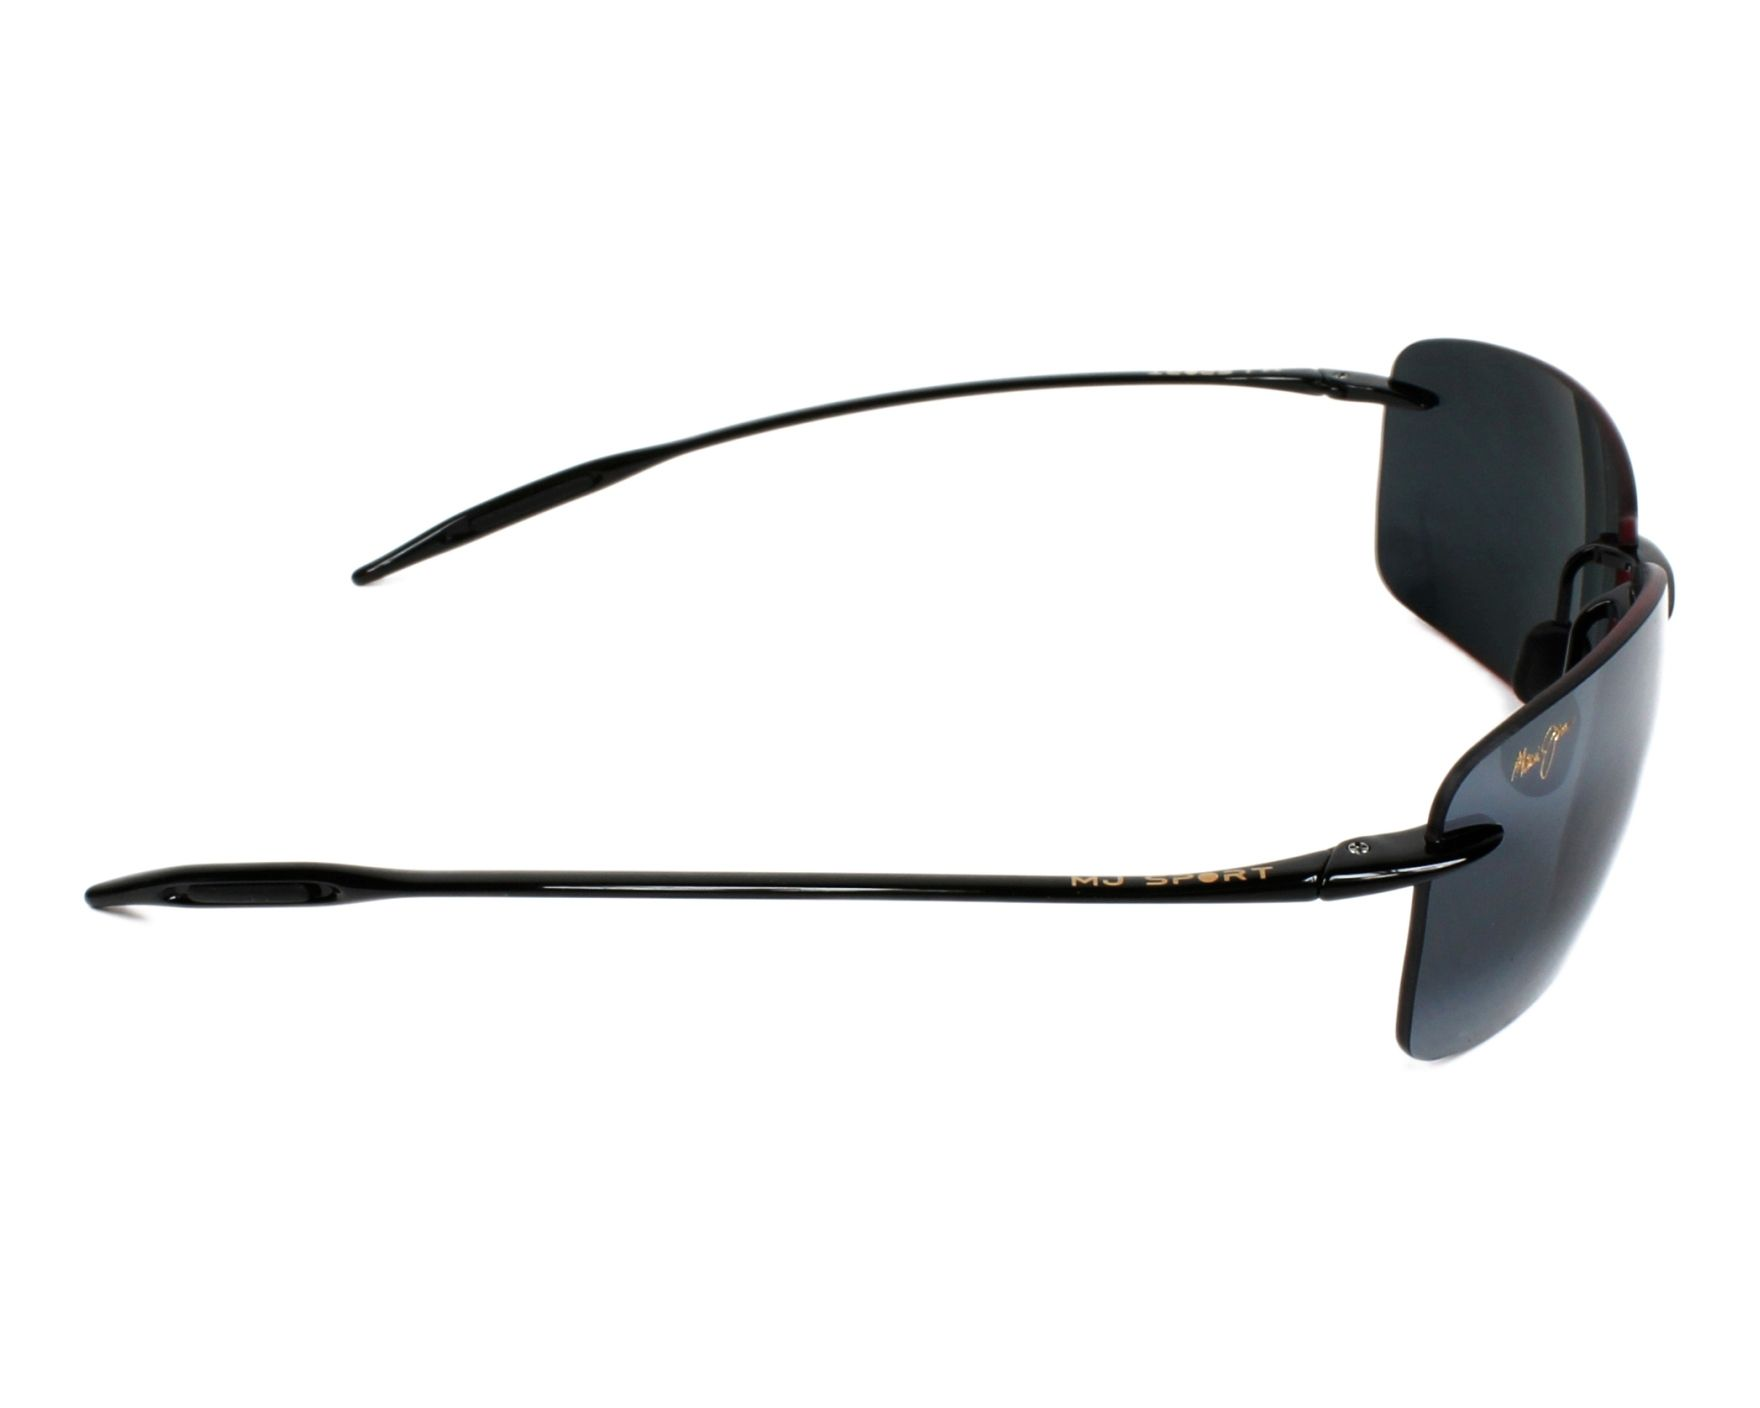 f3c5e2930eb Sunglasses Maui Jim 423 02 67-13 Black side view